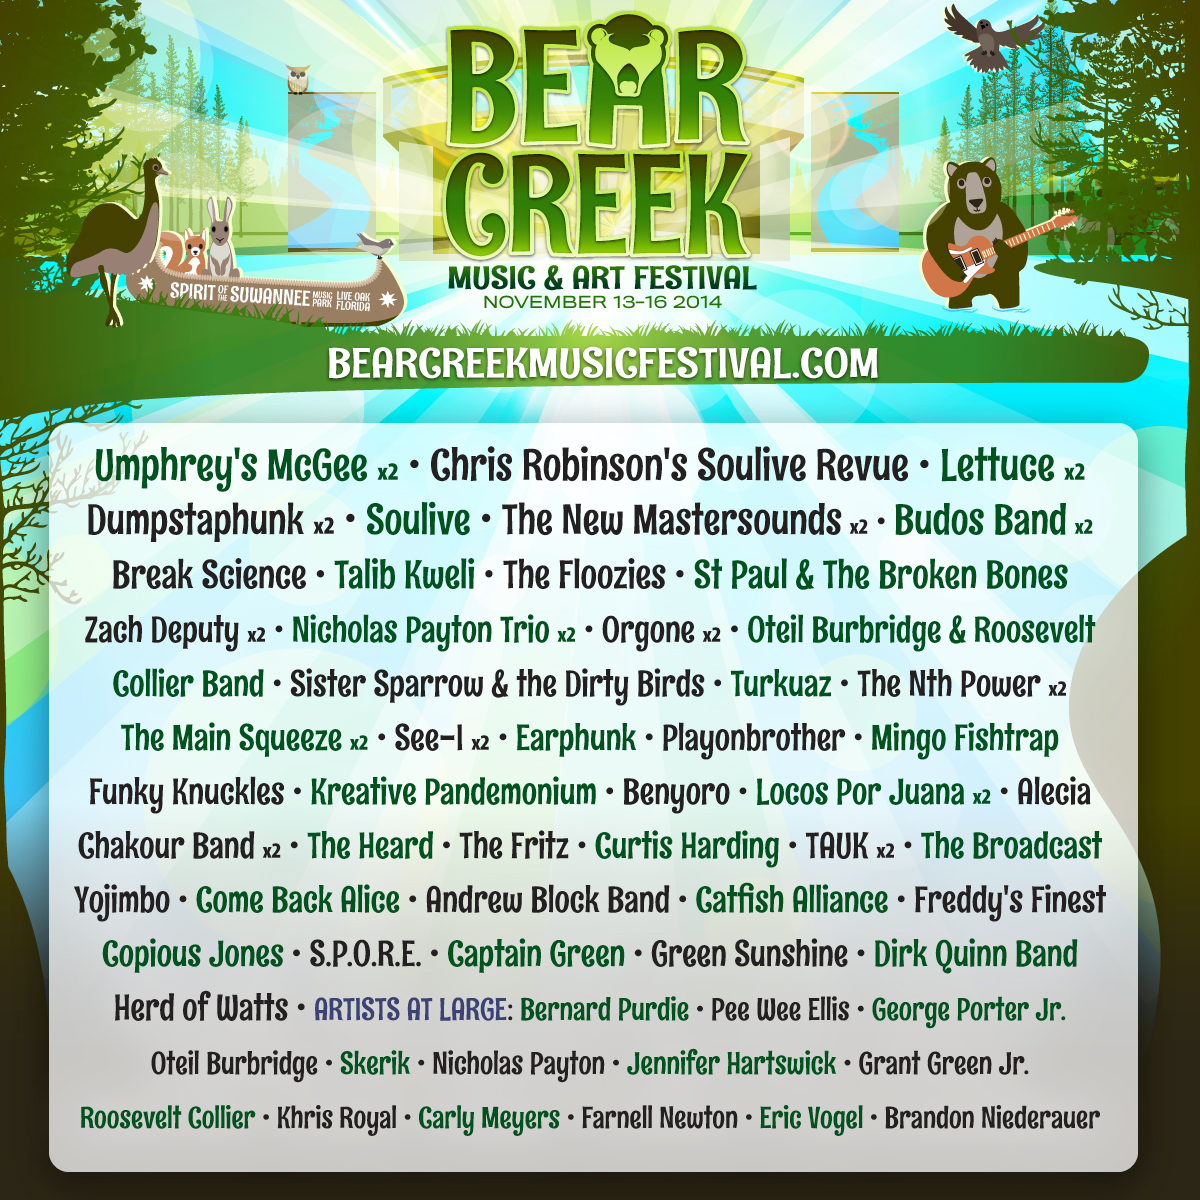 BEAR CREEK MUSIC & ART FESTIVAL ADDS CHRIS ROBINSON SOULIVE REVUE, TALIB KWELI AND MORE